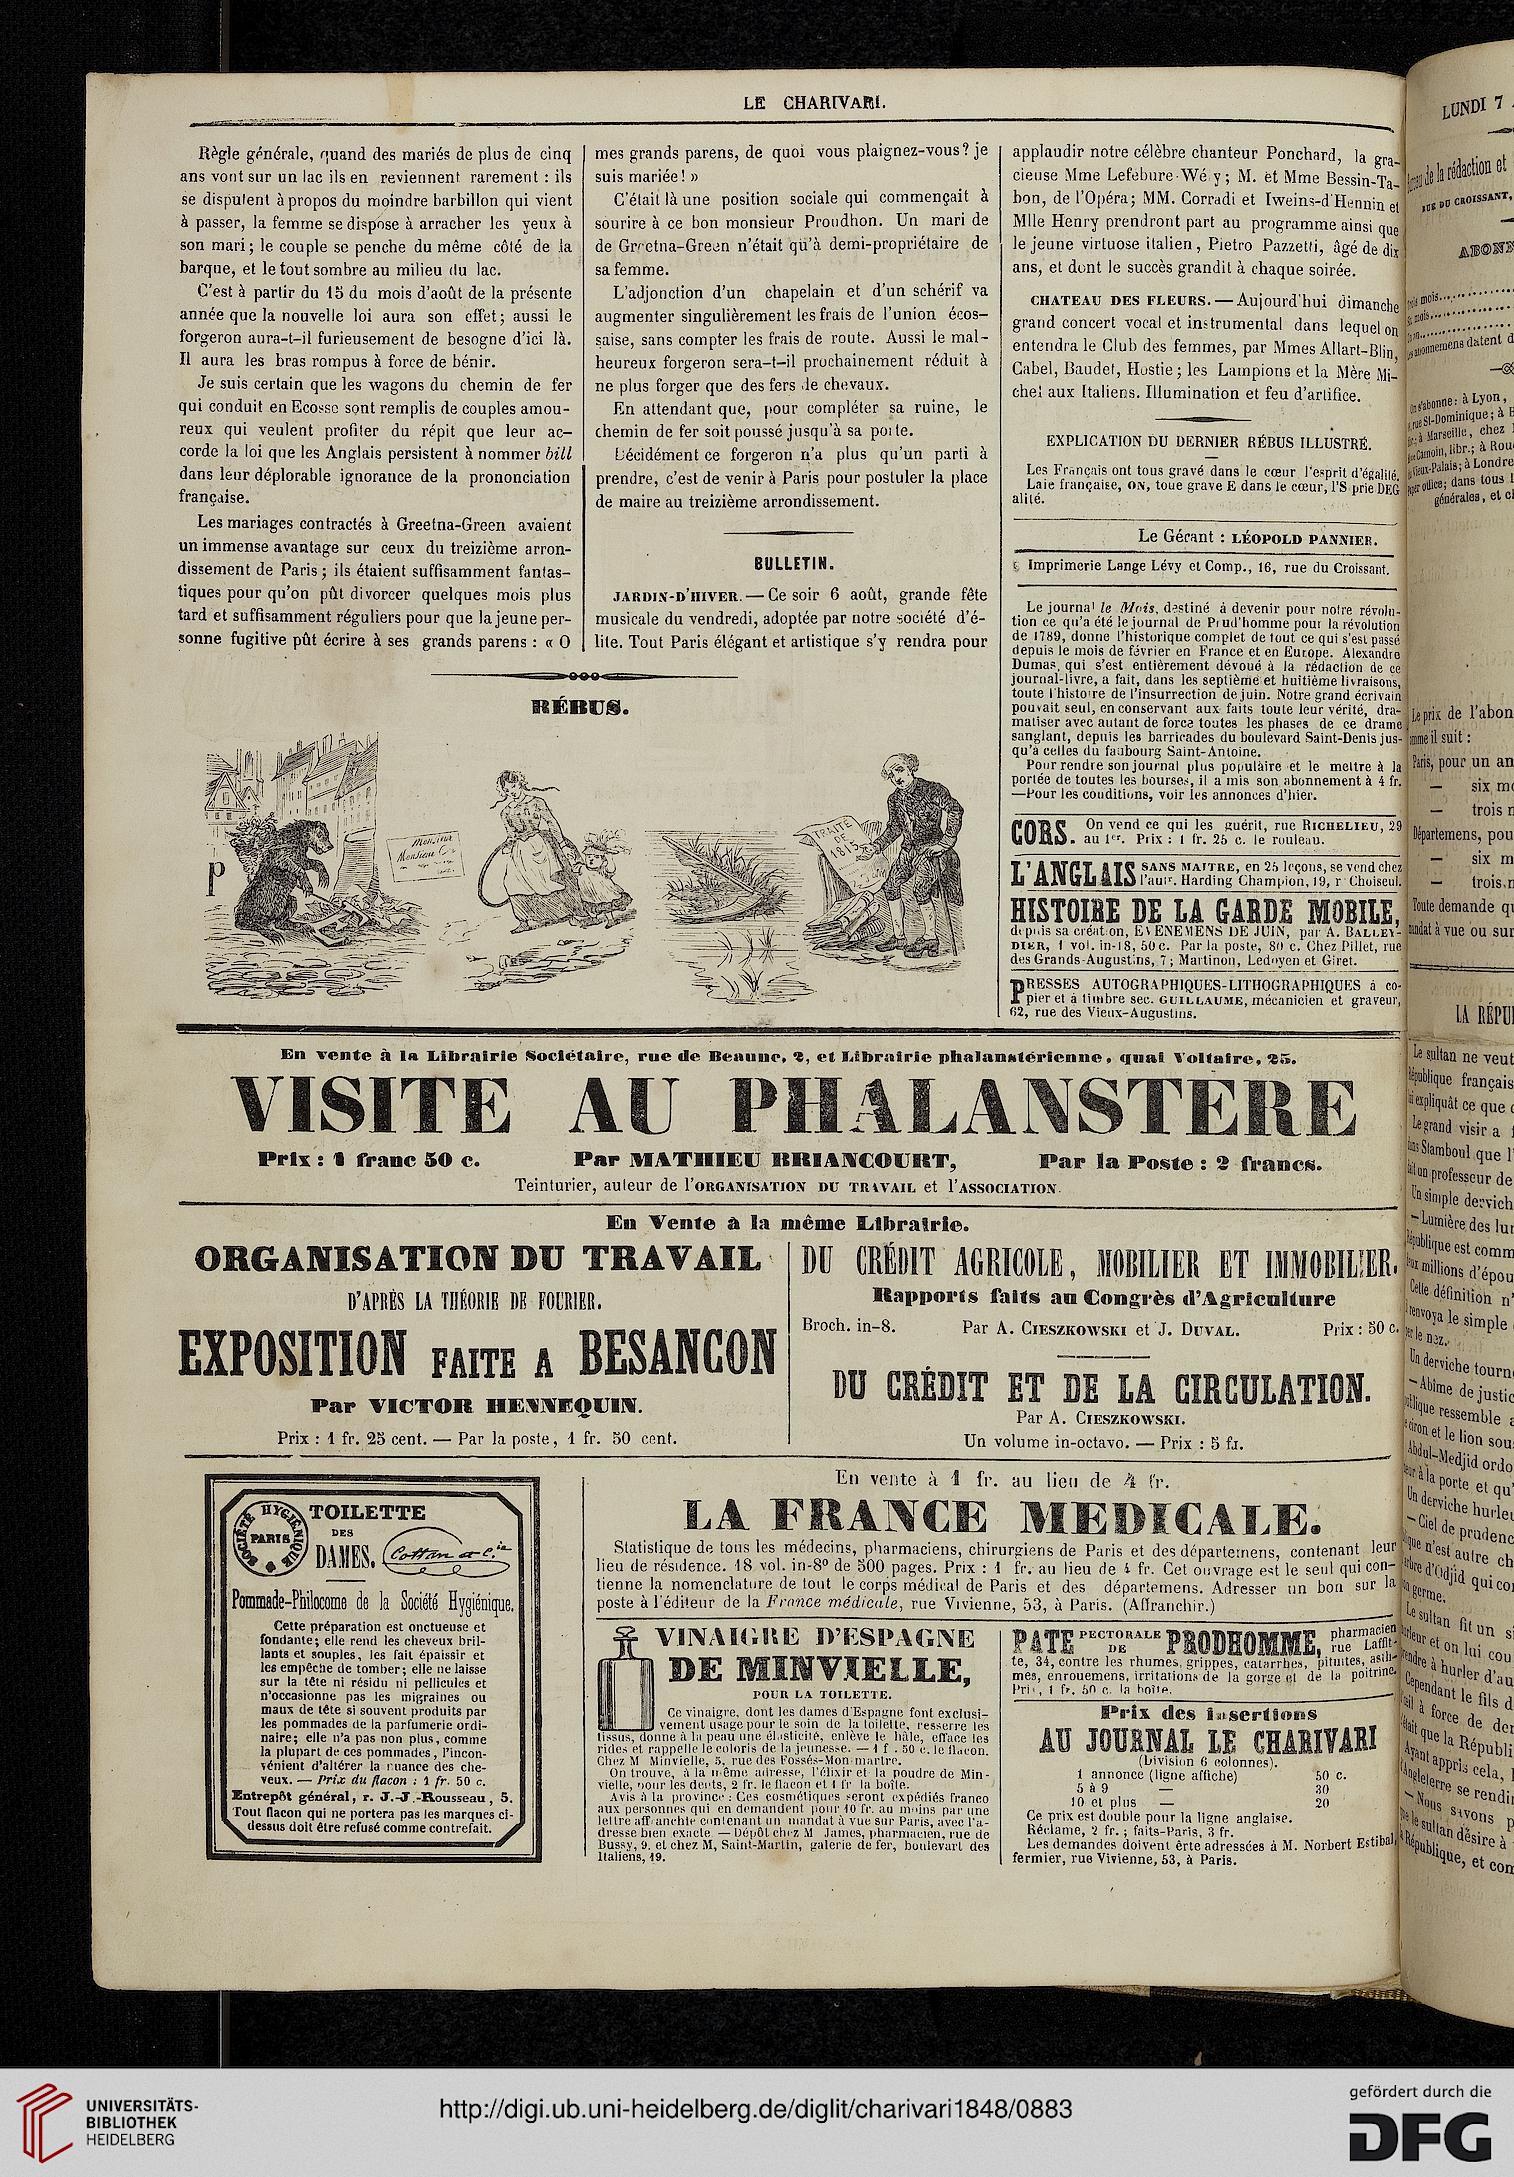 Le Charivari 17 1848